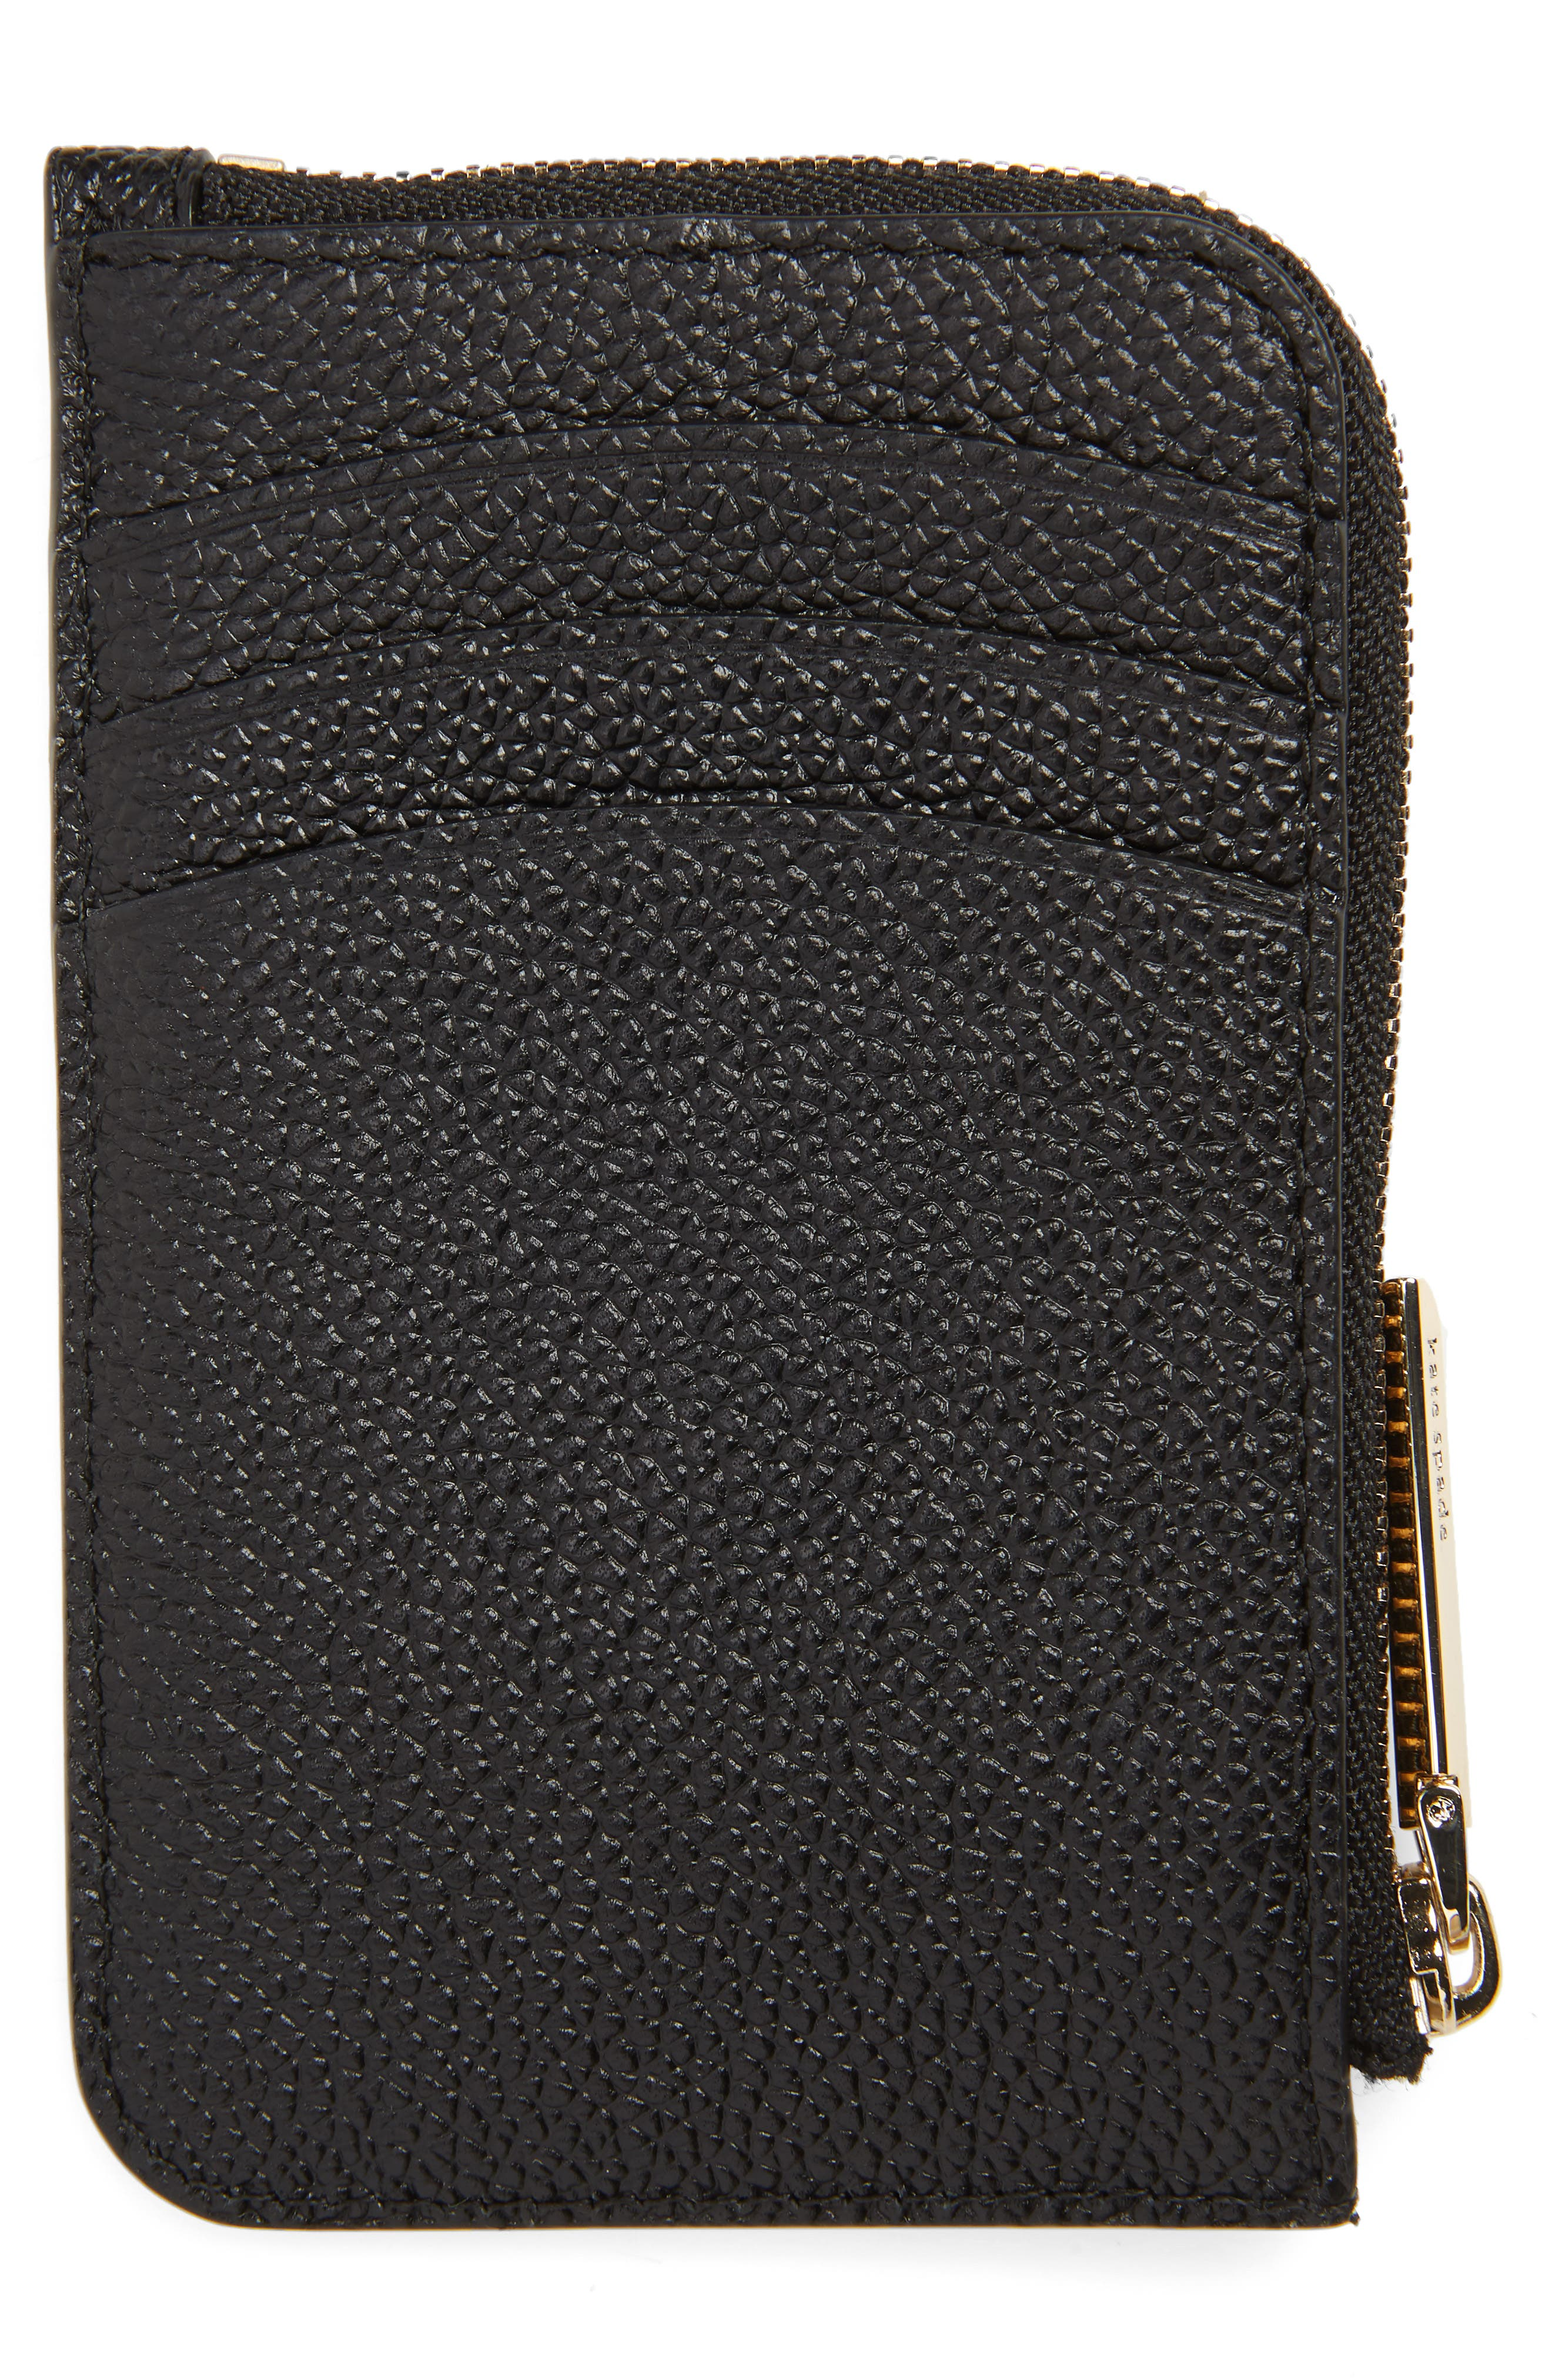 KATE SPADE NEW YORK,                             margaux leather zip card holder,                             Alternate thumbnail 3, color,                             BLACK